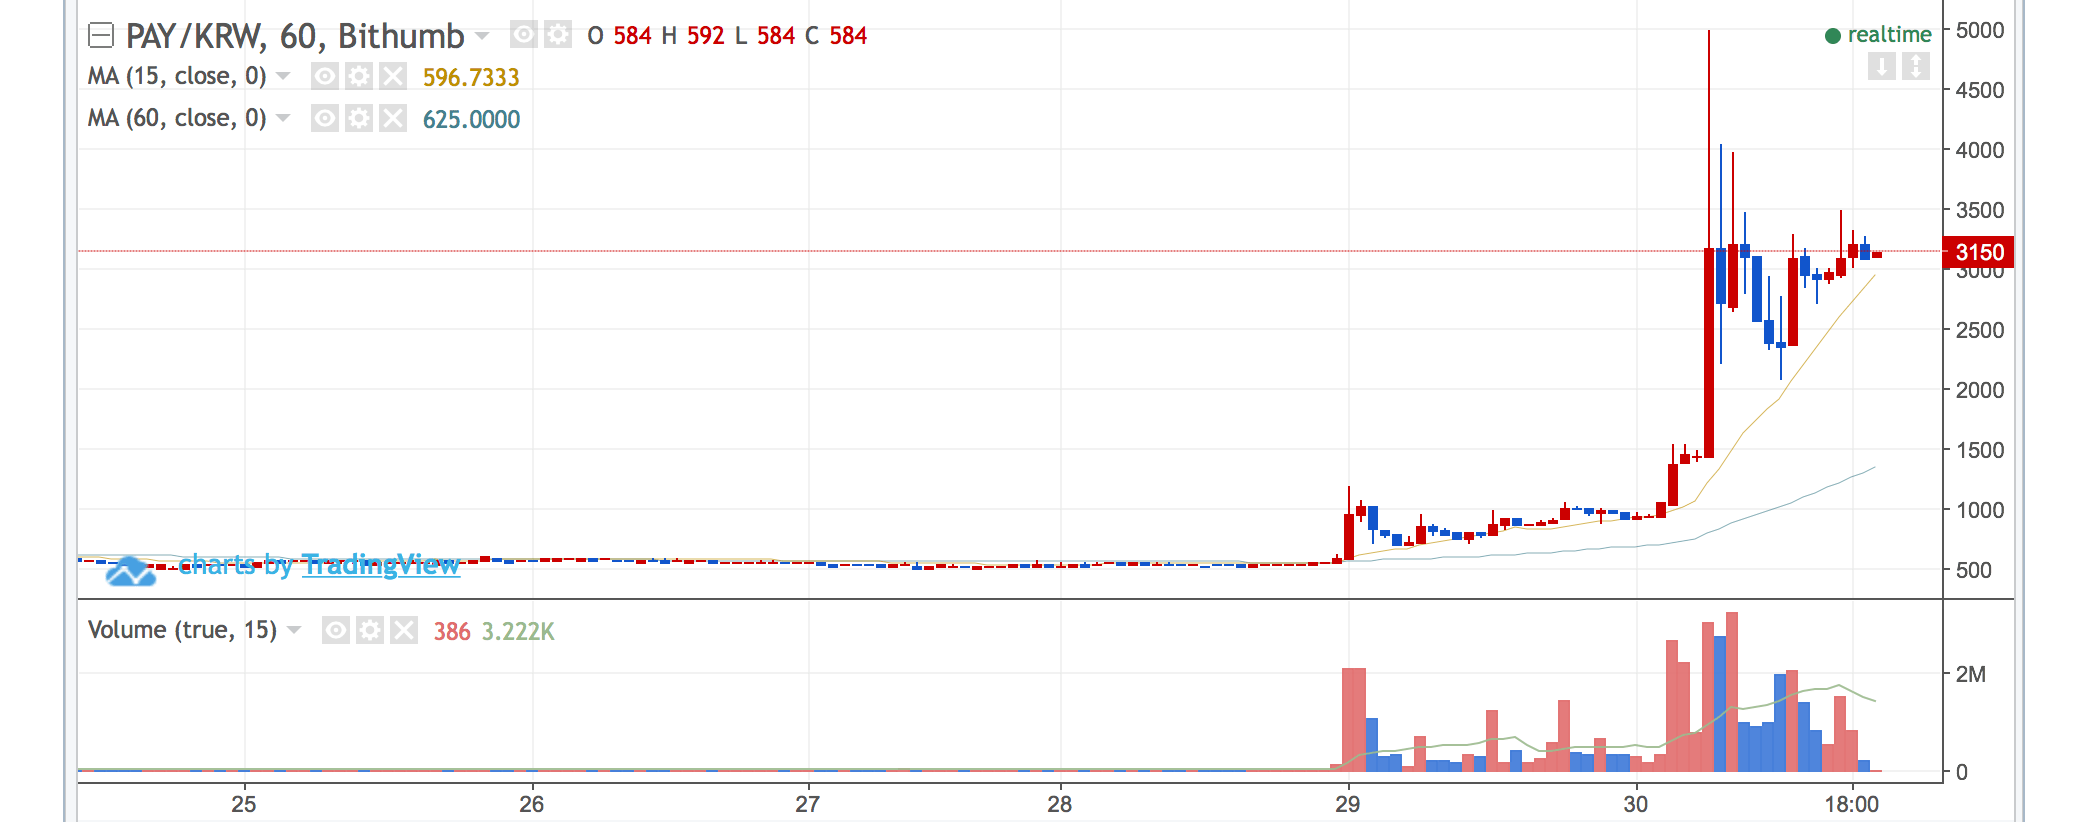 TenX испытал 400% подъём на бирже Bithumb